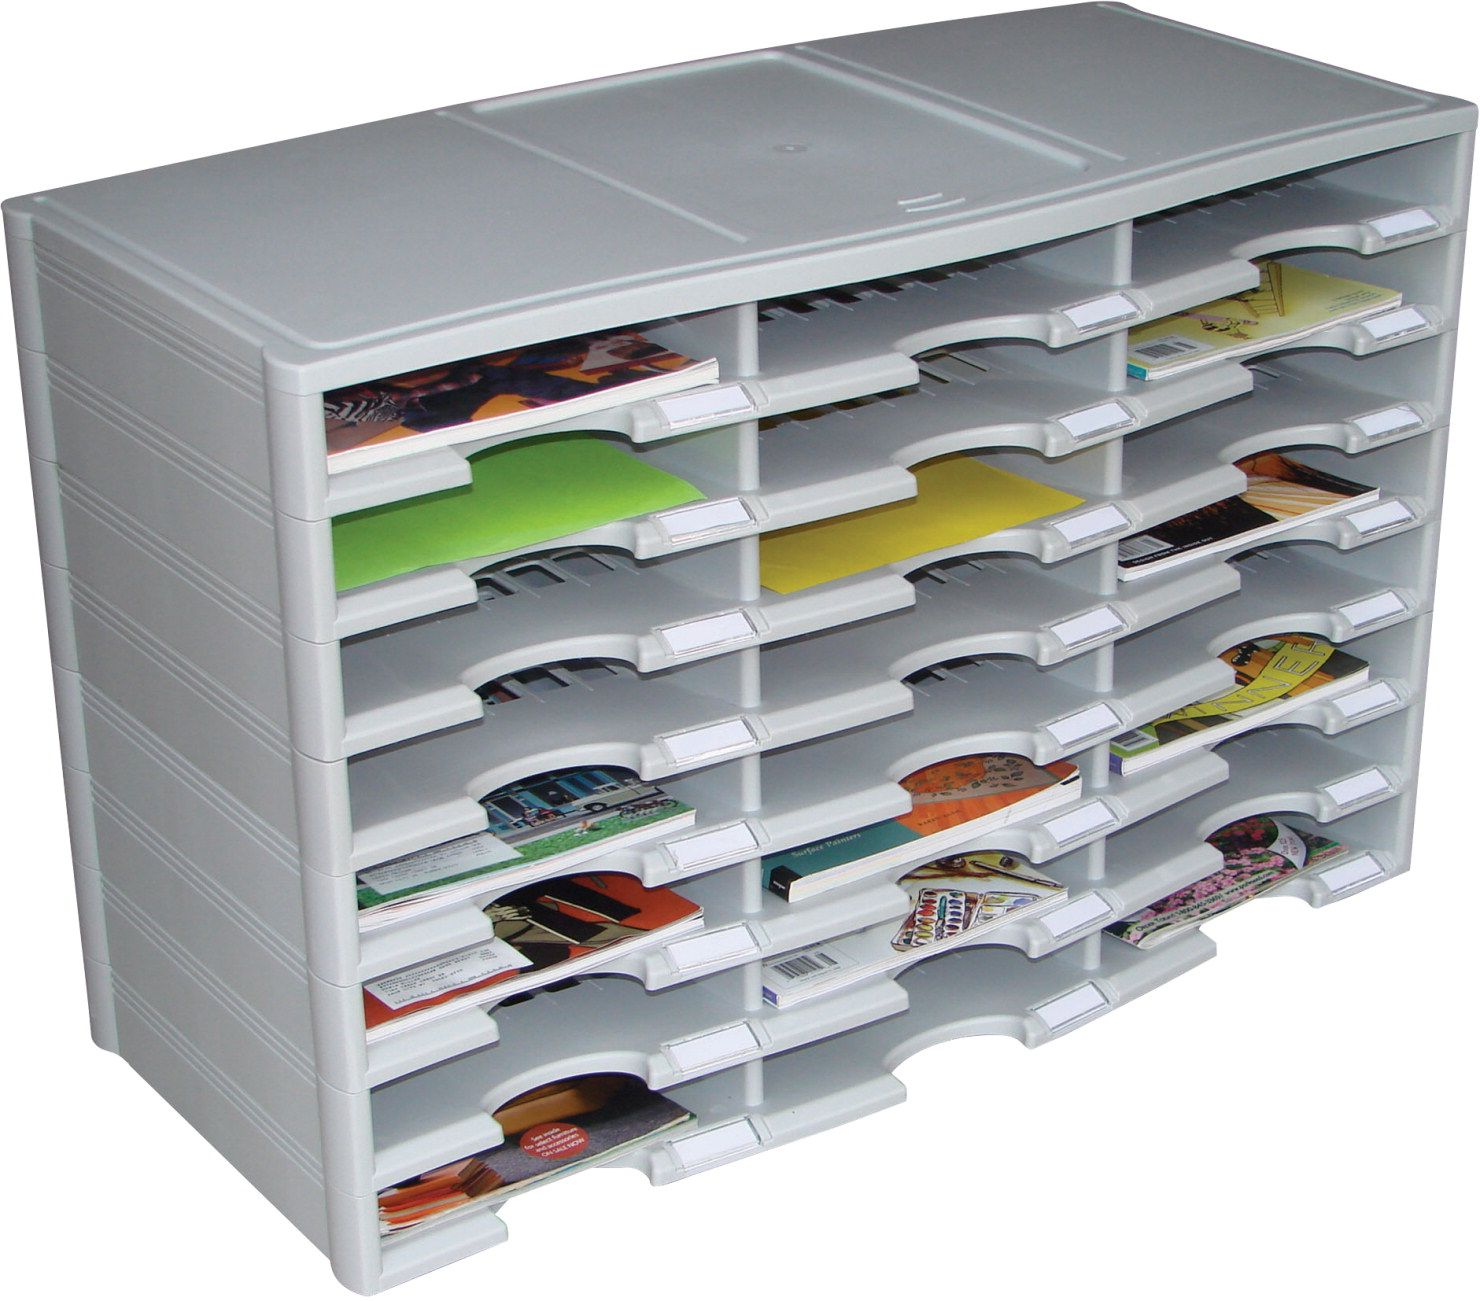 Storex Literature Organizer 24 Compartments Gray Edclassroom